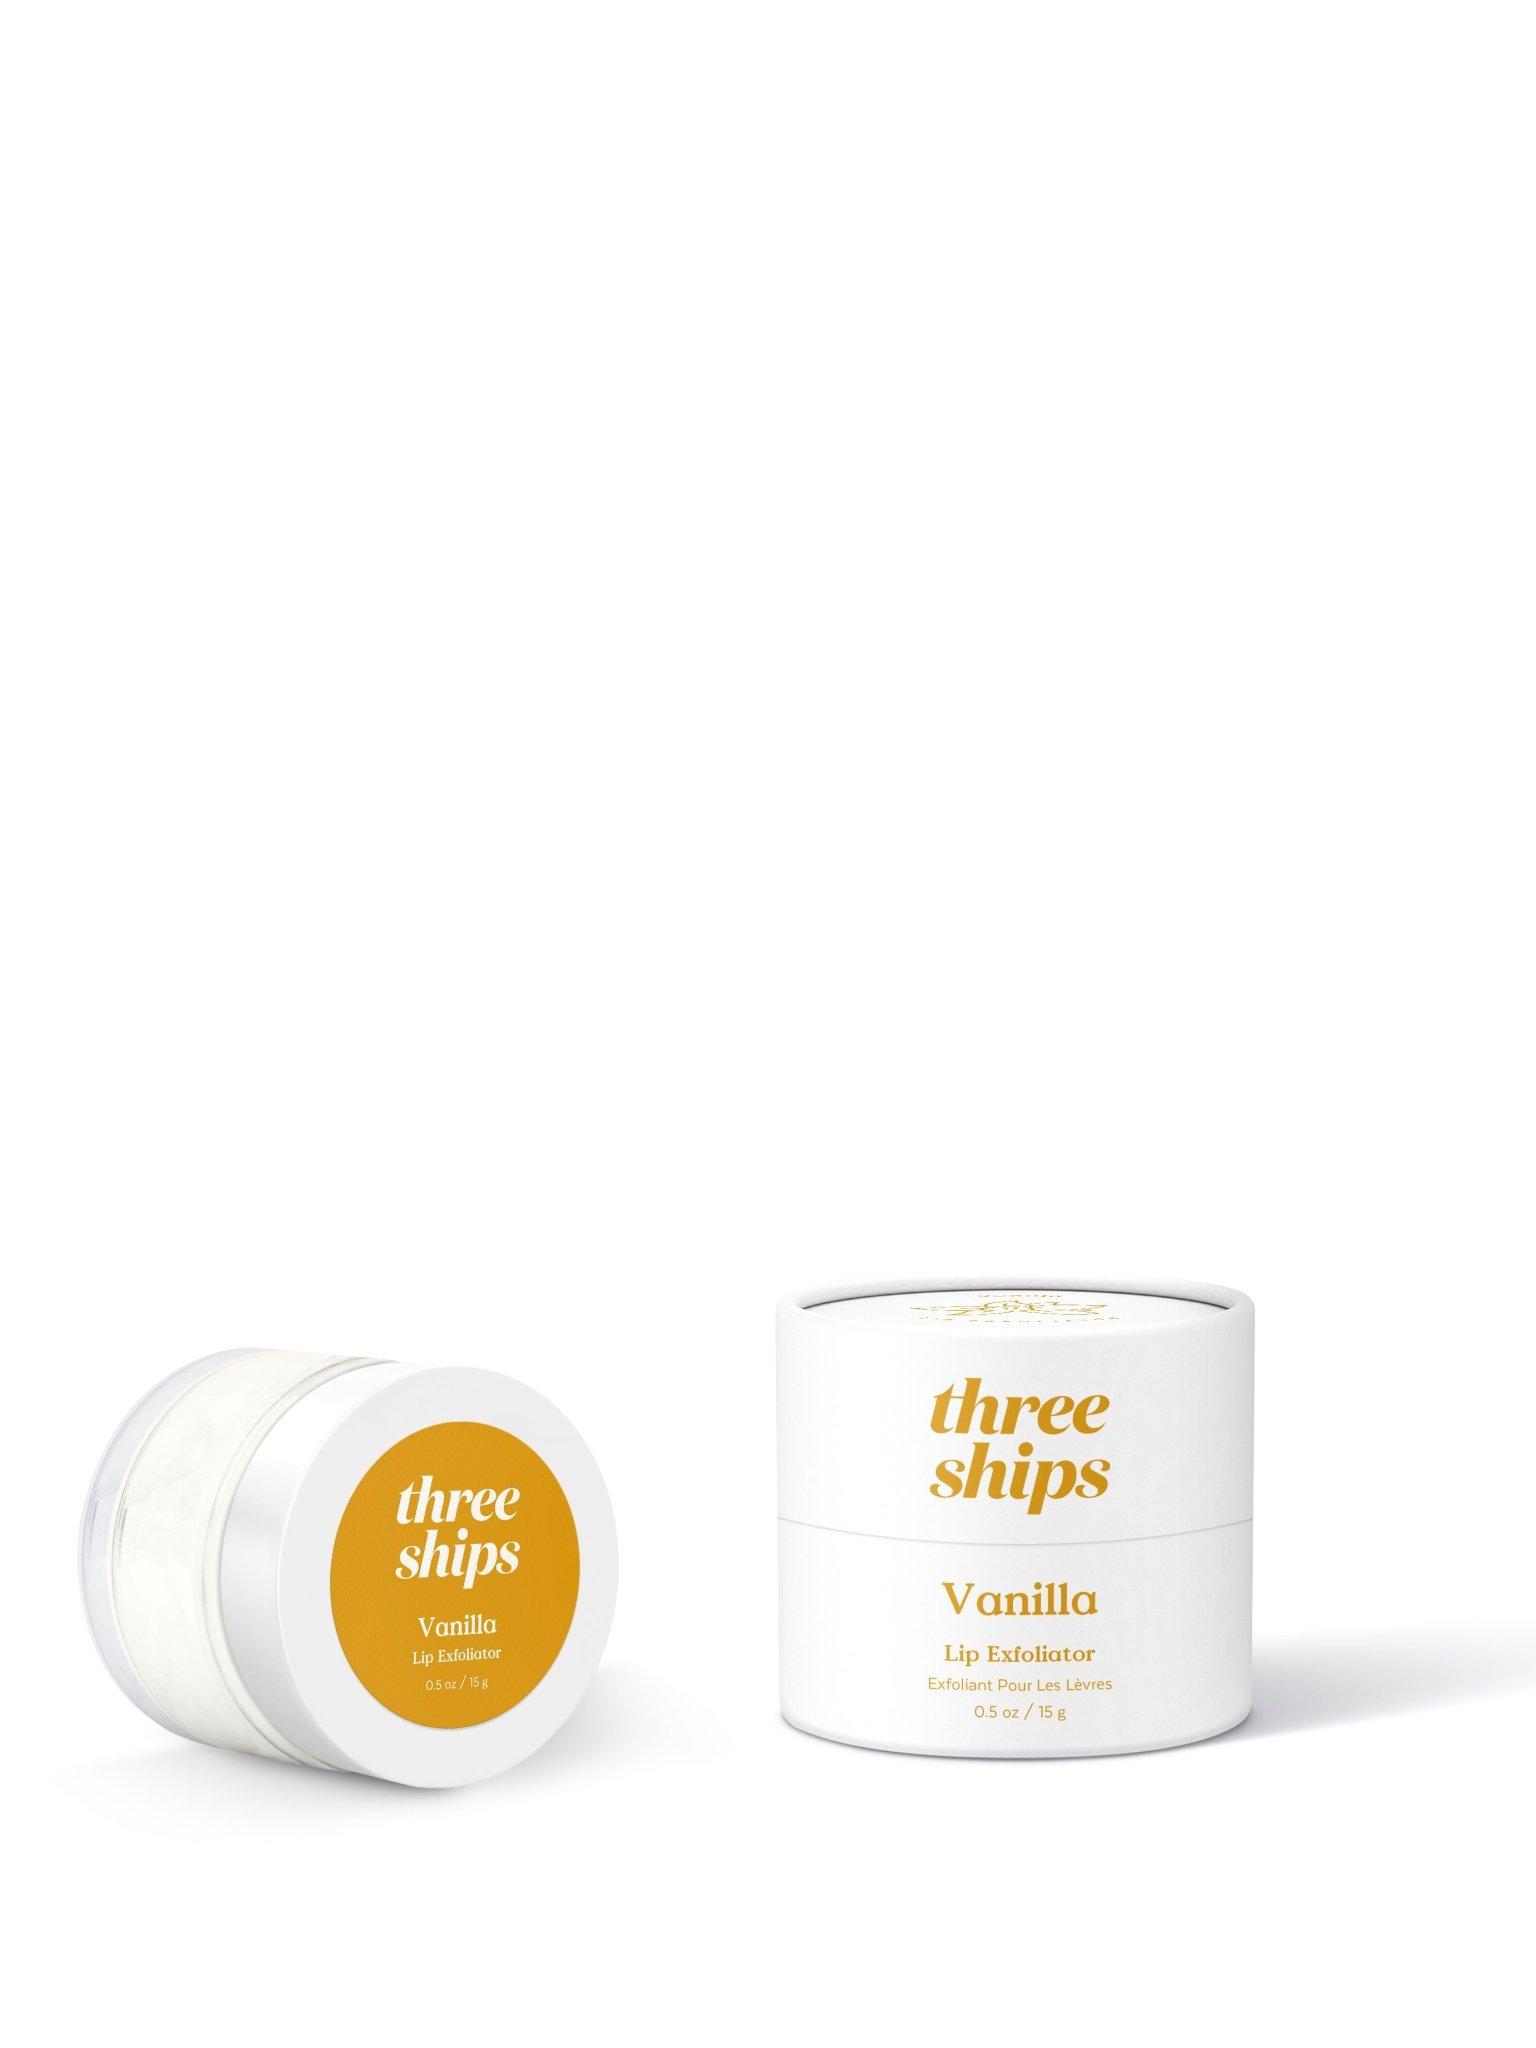 Vanilla Lip Exfoliator